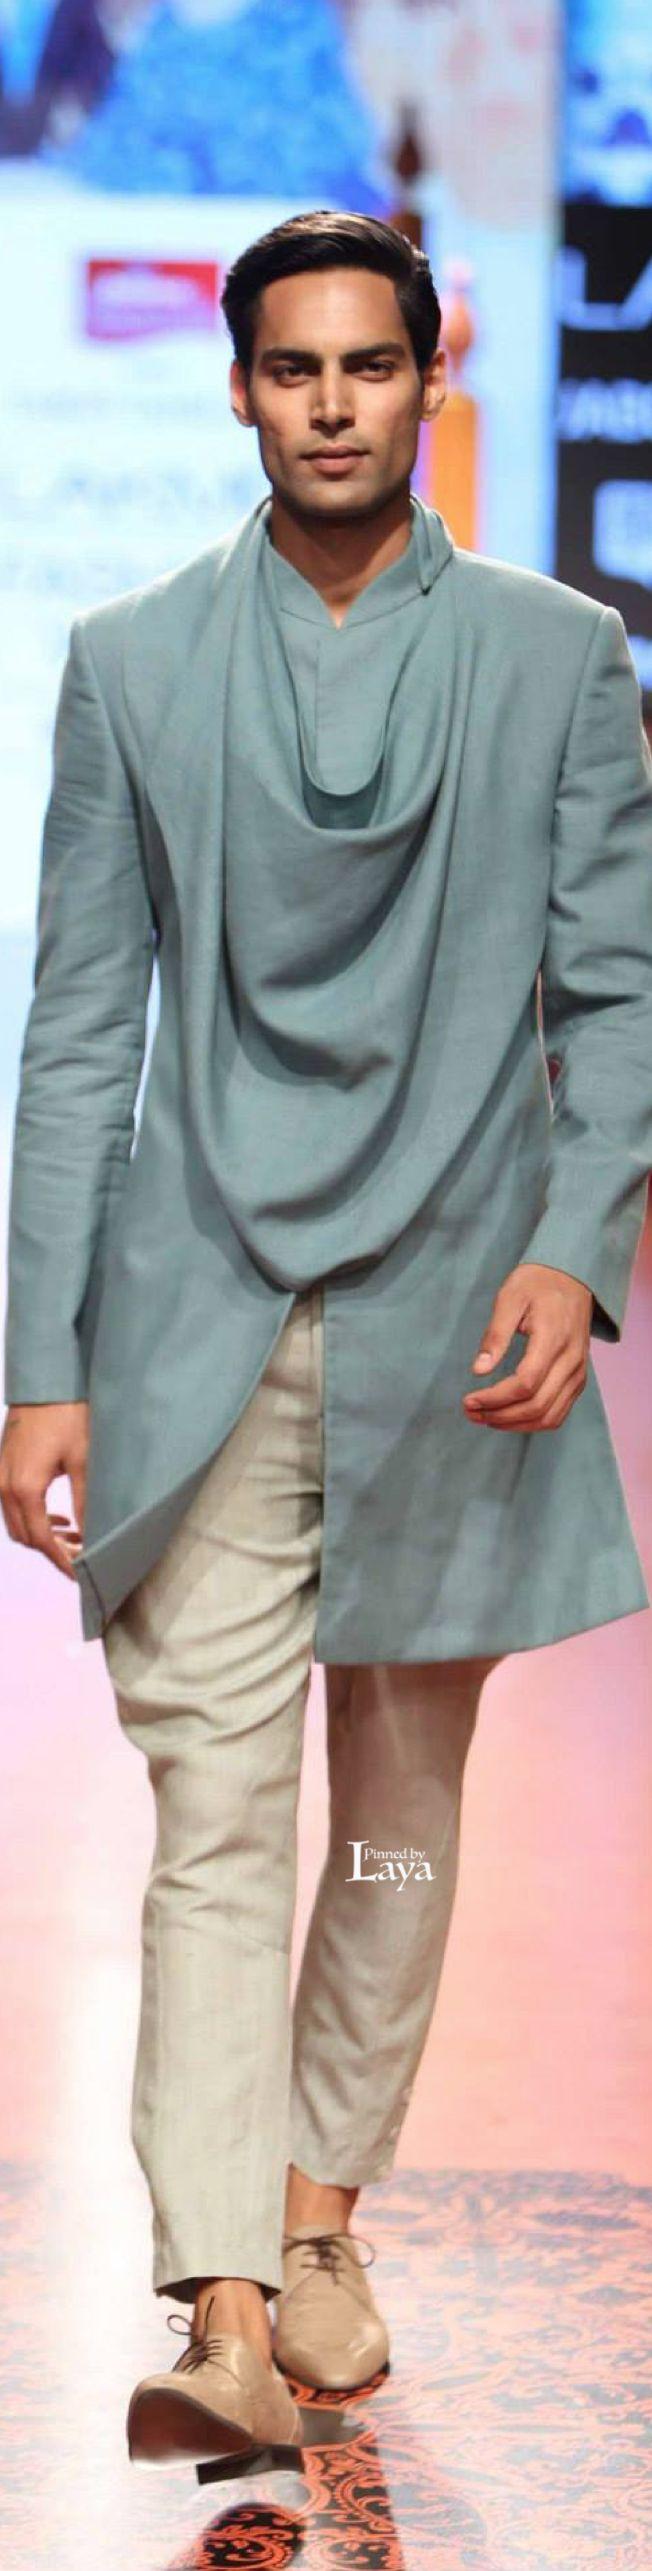 16 best Fashion images on Pinterest | Men fashion, Indian weddings ...